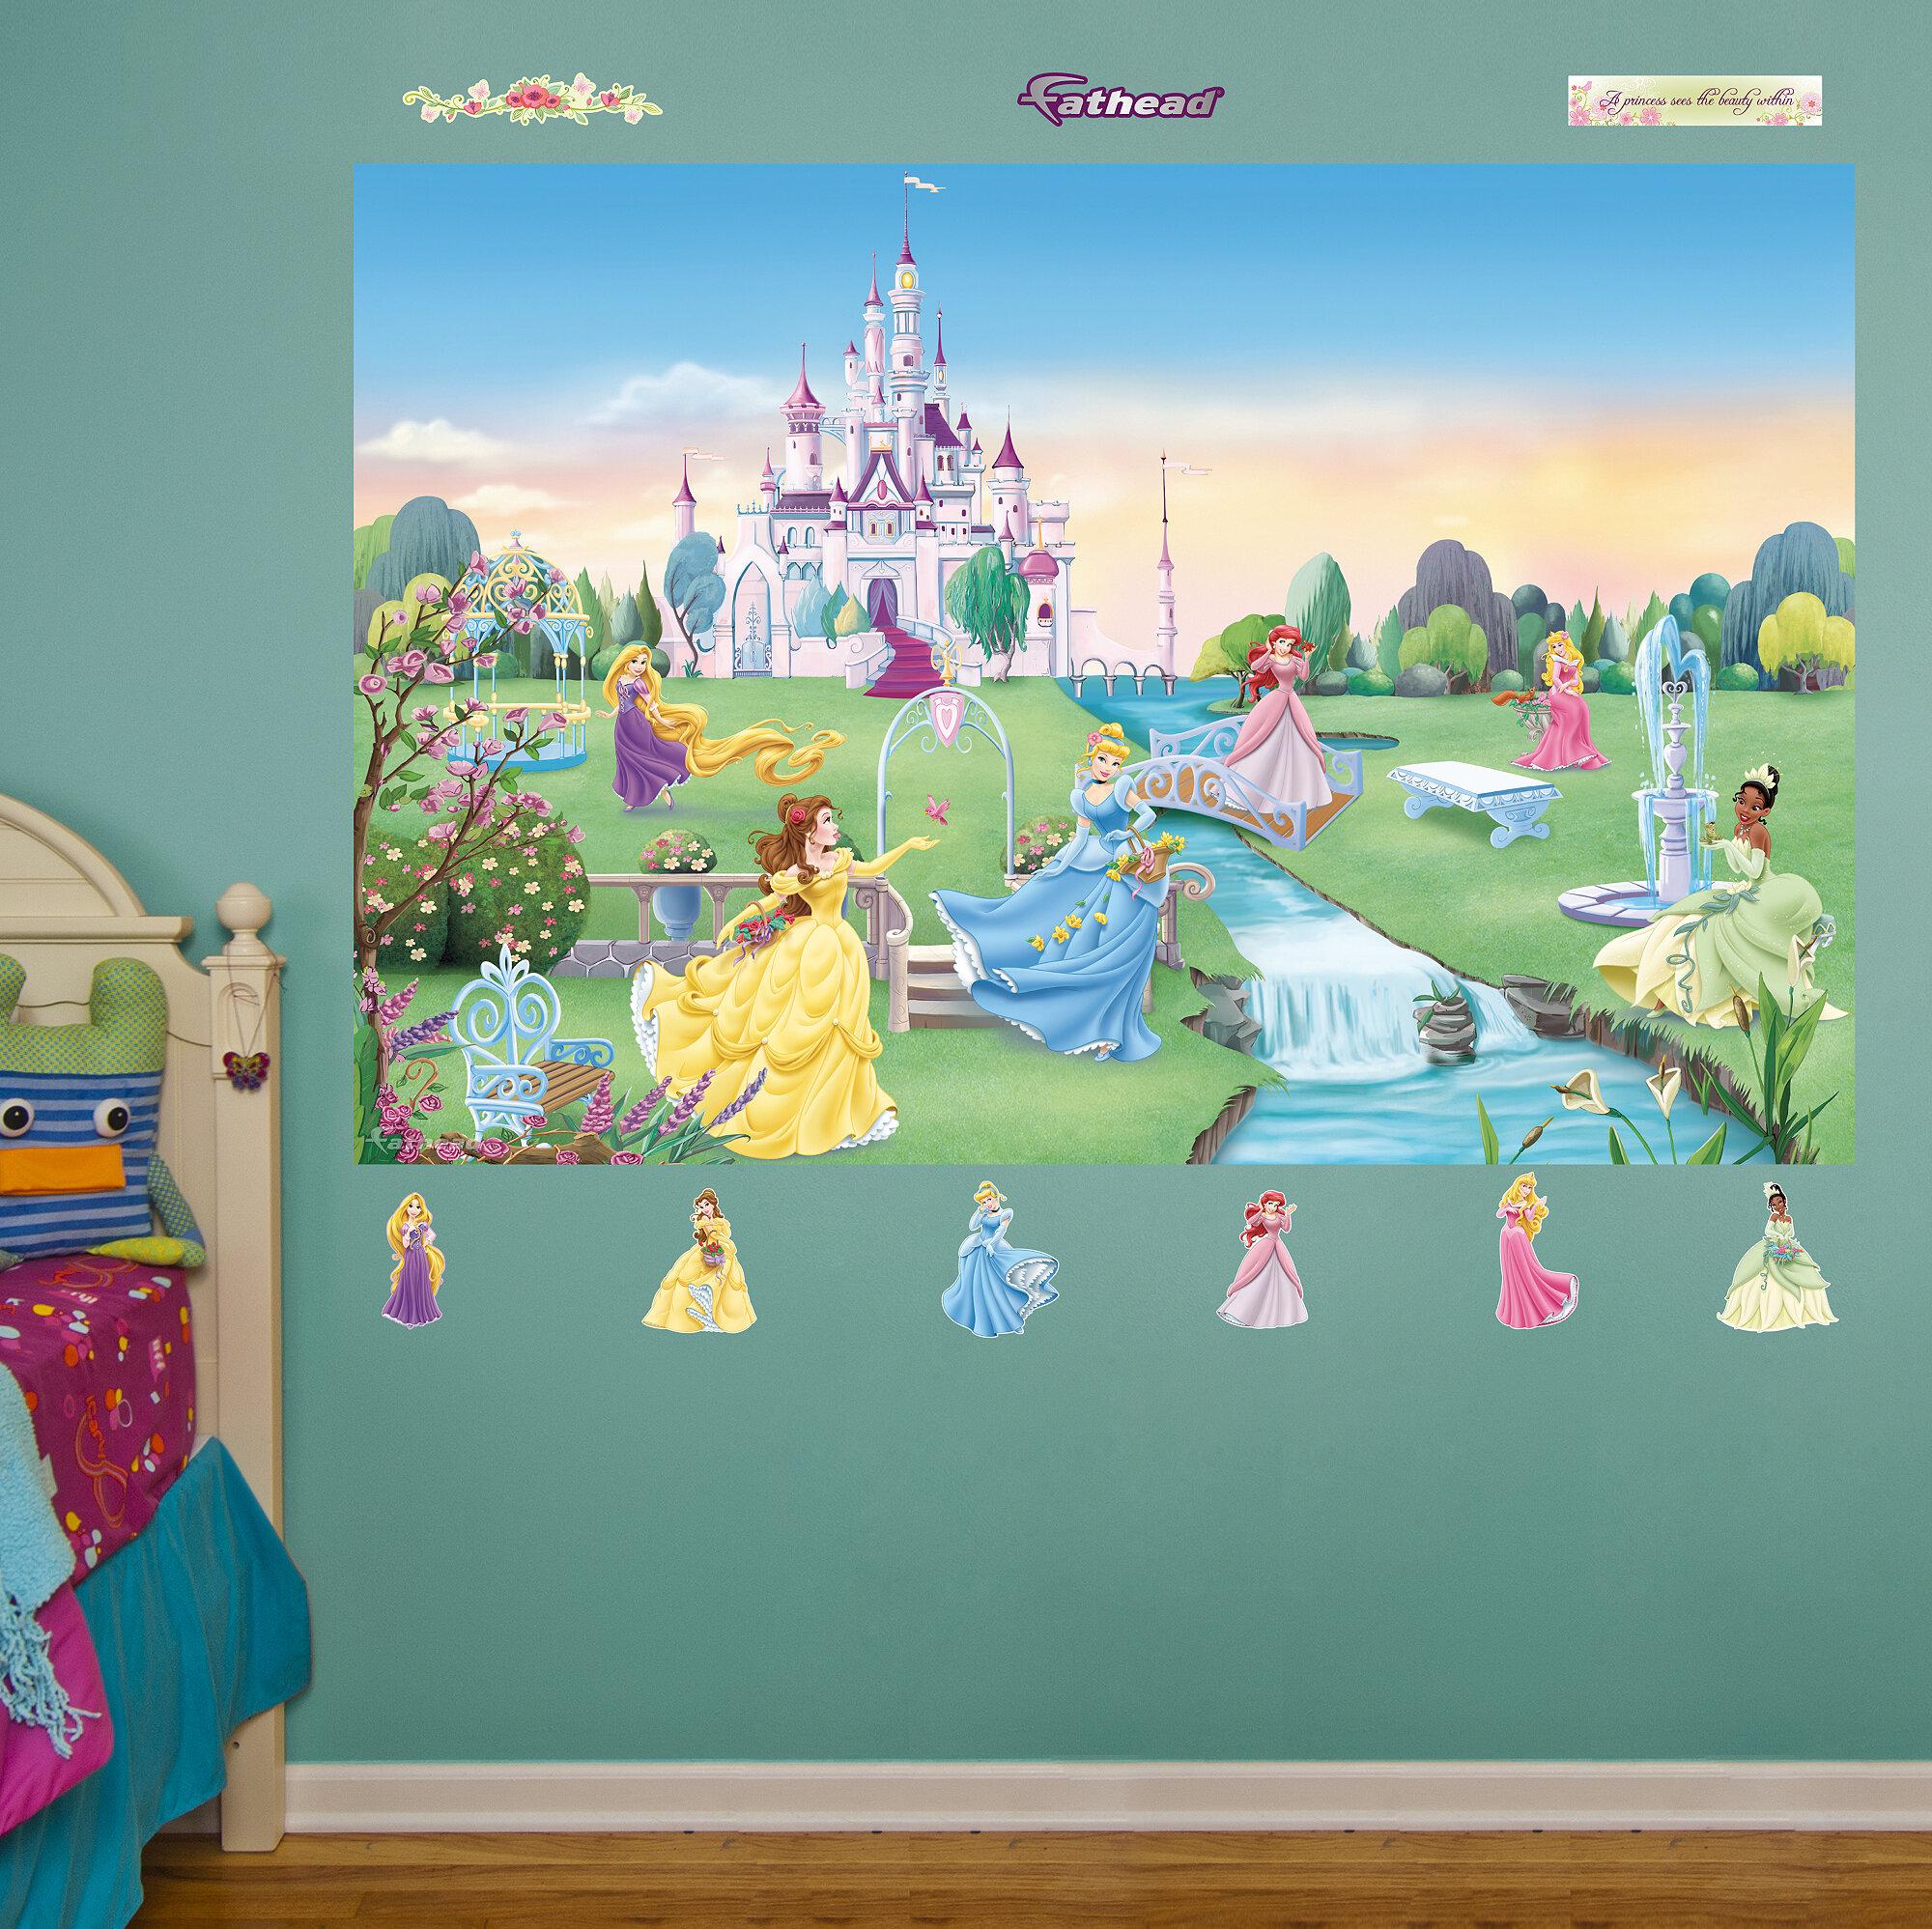 Delightful Fathead Disney Princess Wall Decal U0026 Reviews | Wayfair